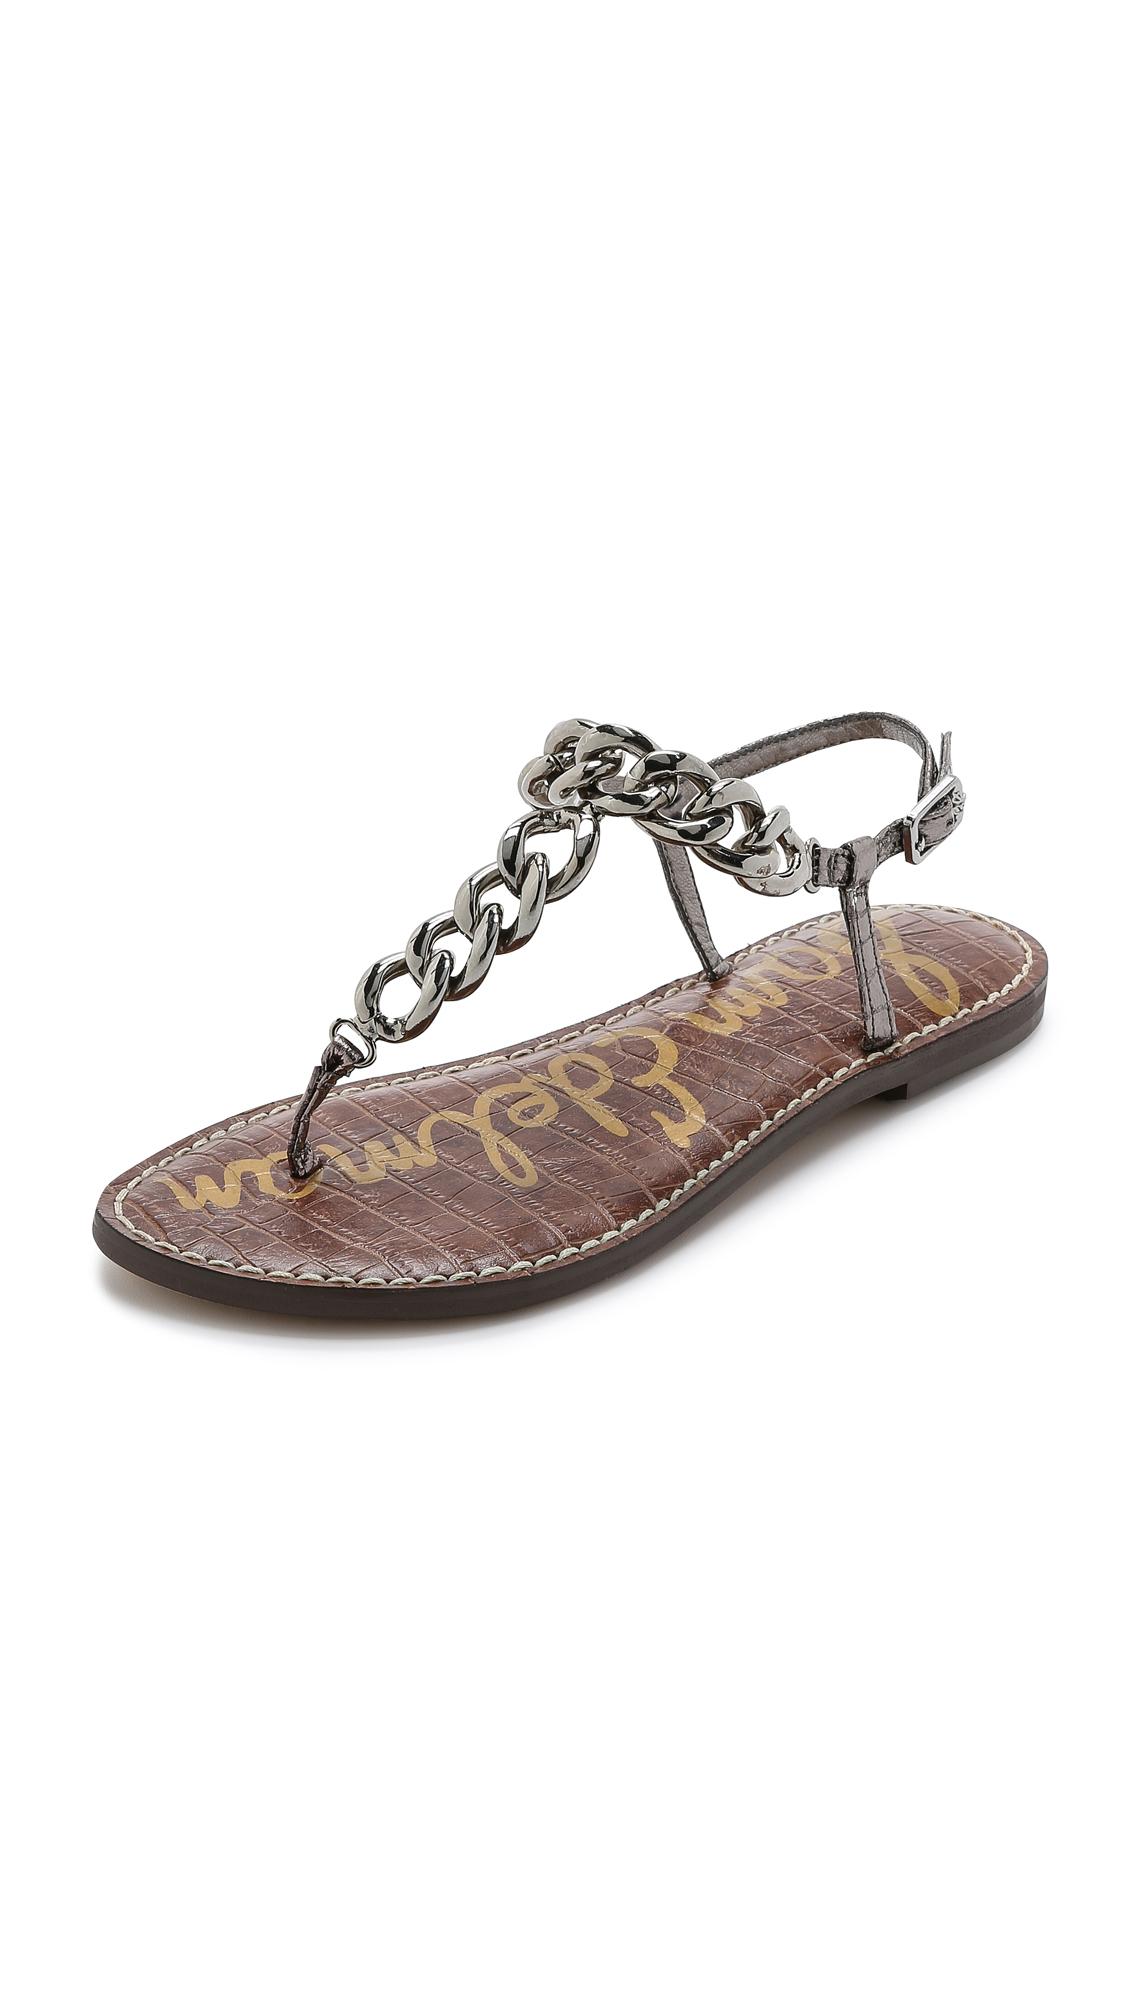 03b5e4c5d8257d Lyst - Sam Edelman Grella Chain Strap Sandals - Pewter in Metallic